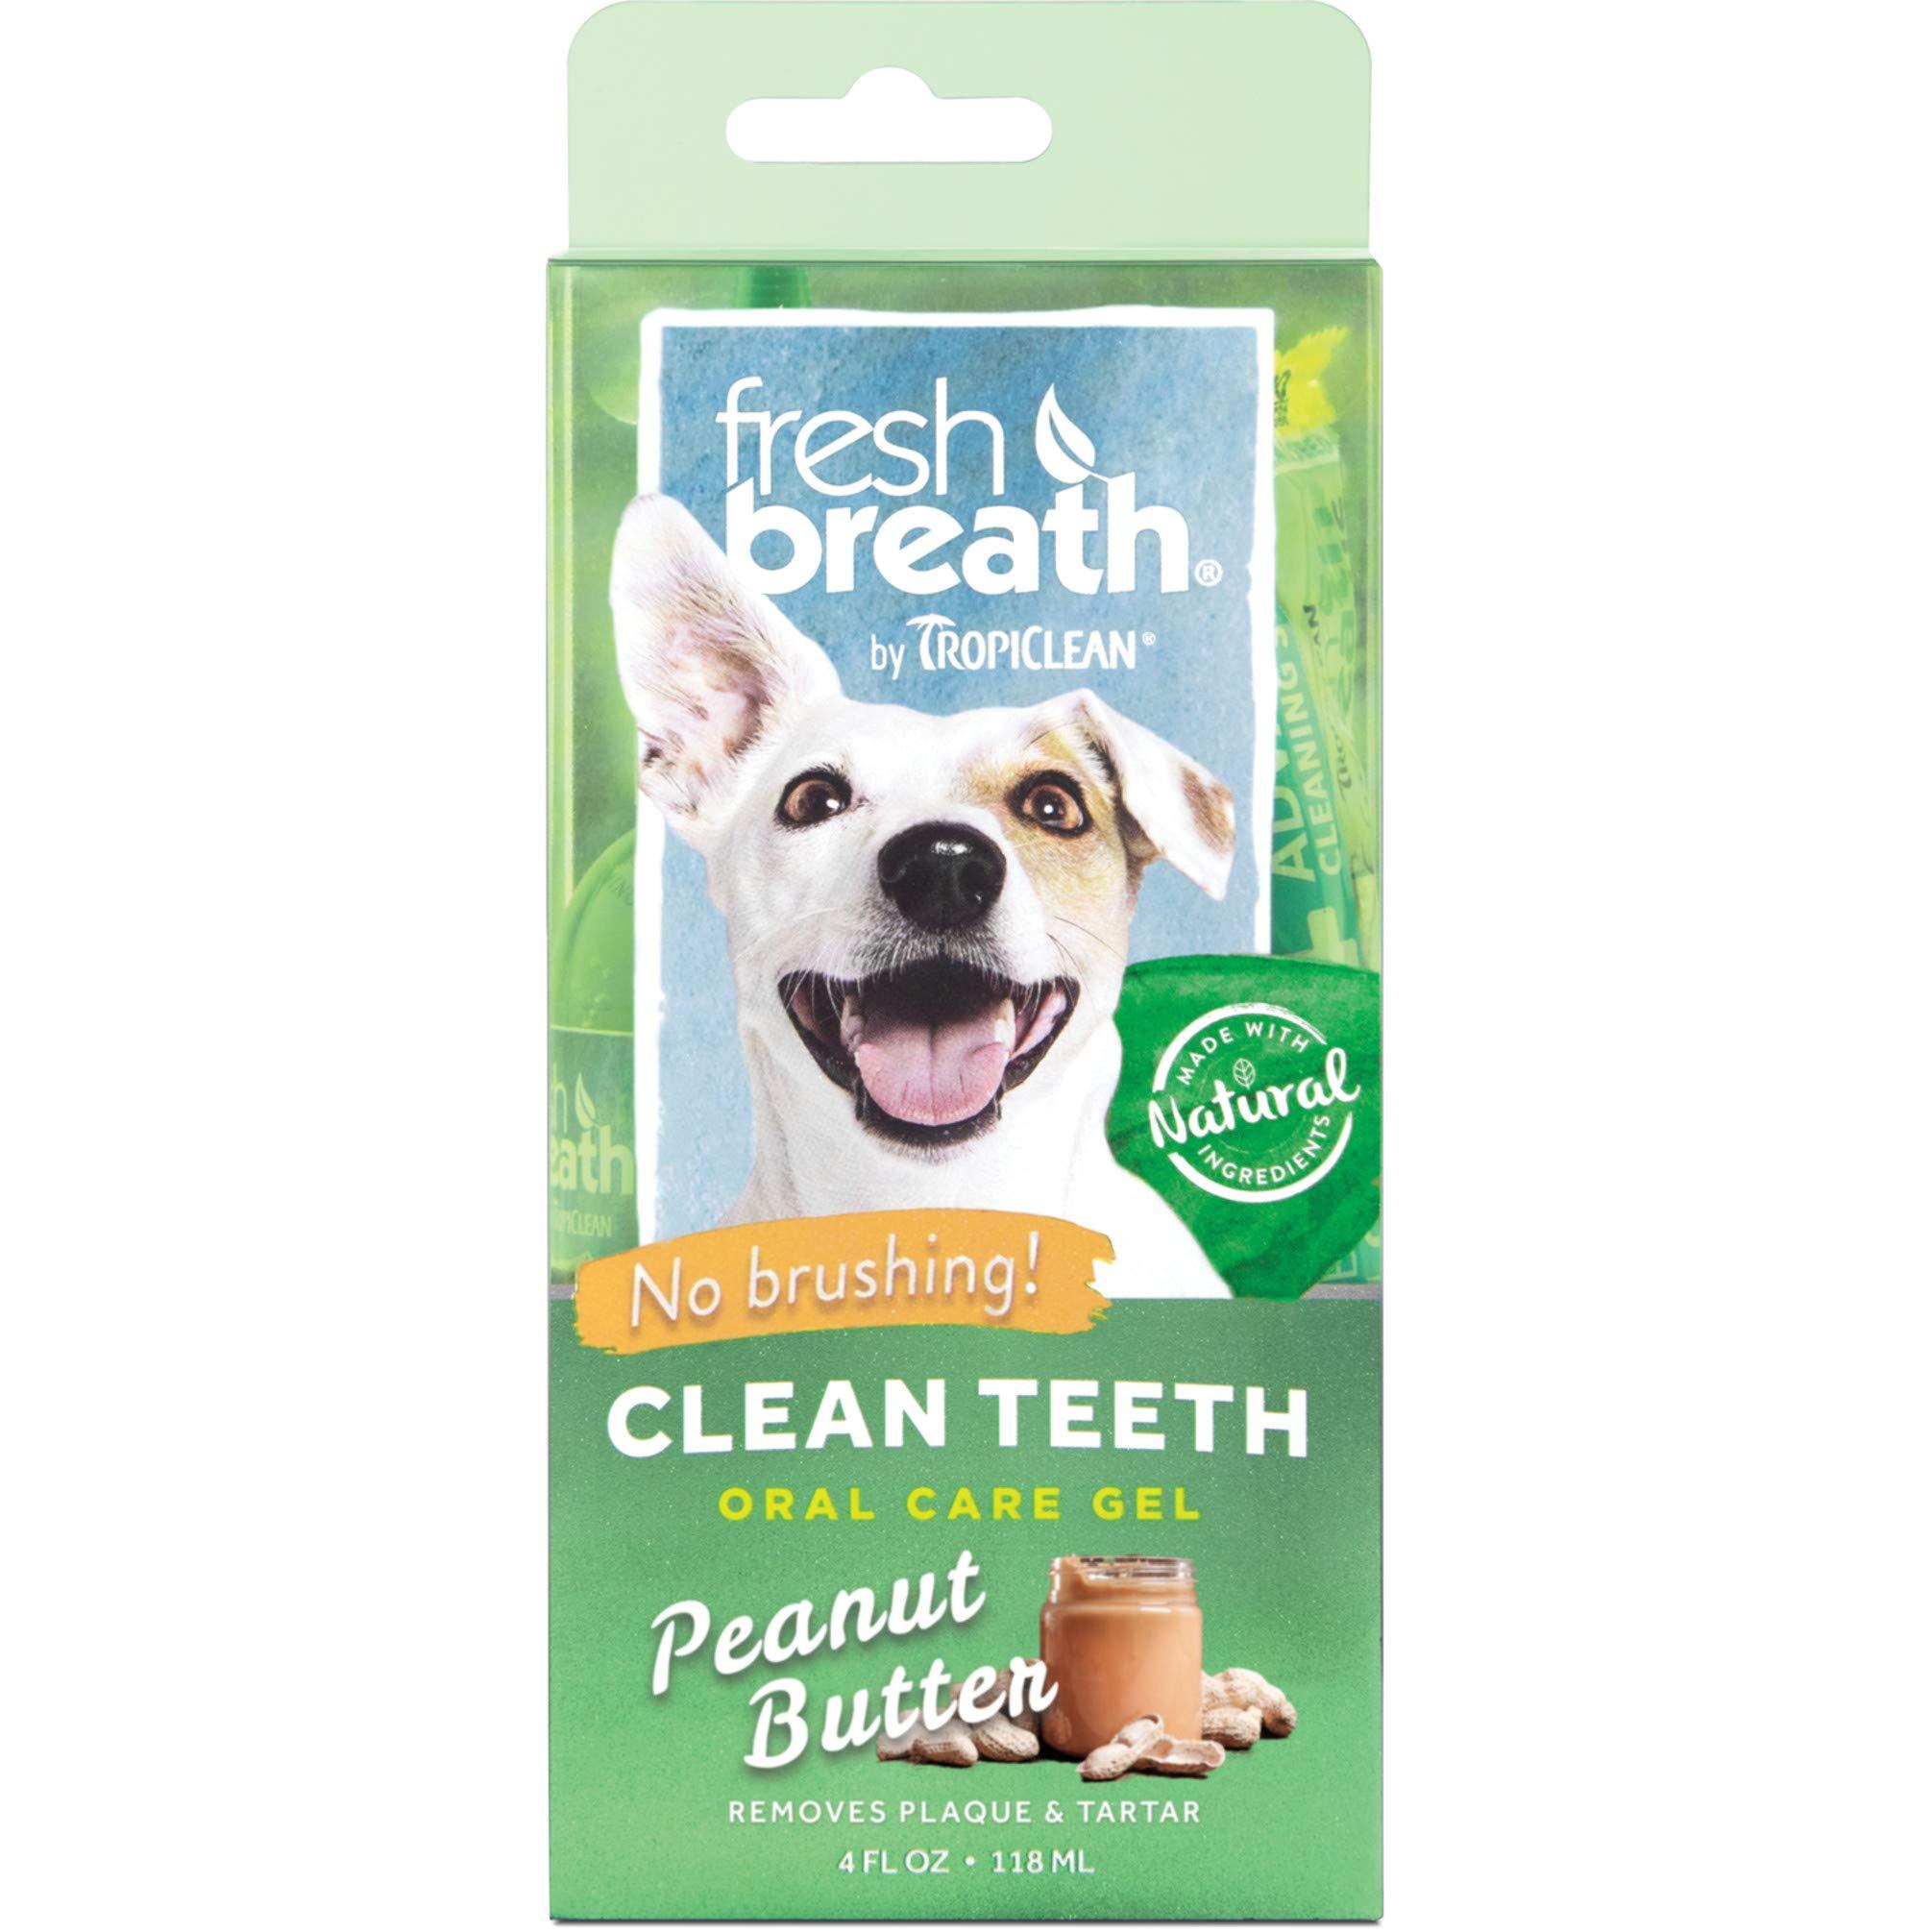 TropiClean Fresh Breath Peanut Butter Flavor Clean Teeth Gel for Dogs, 4oz, Made in USA by TropiClean